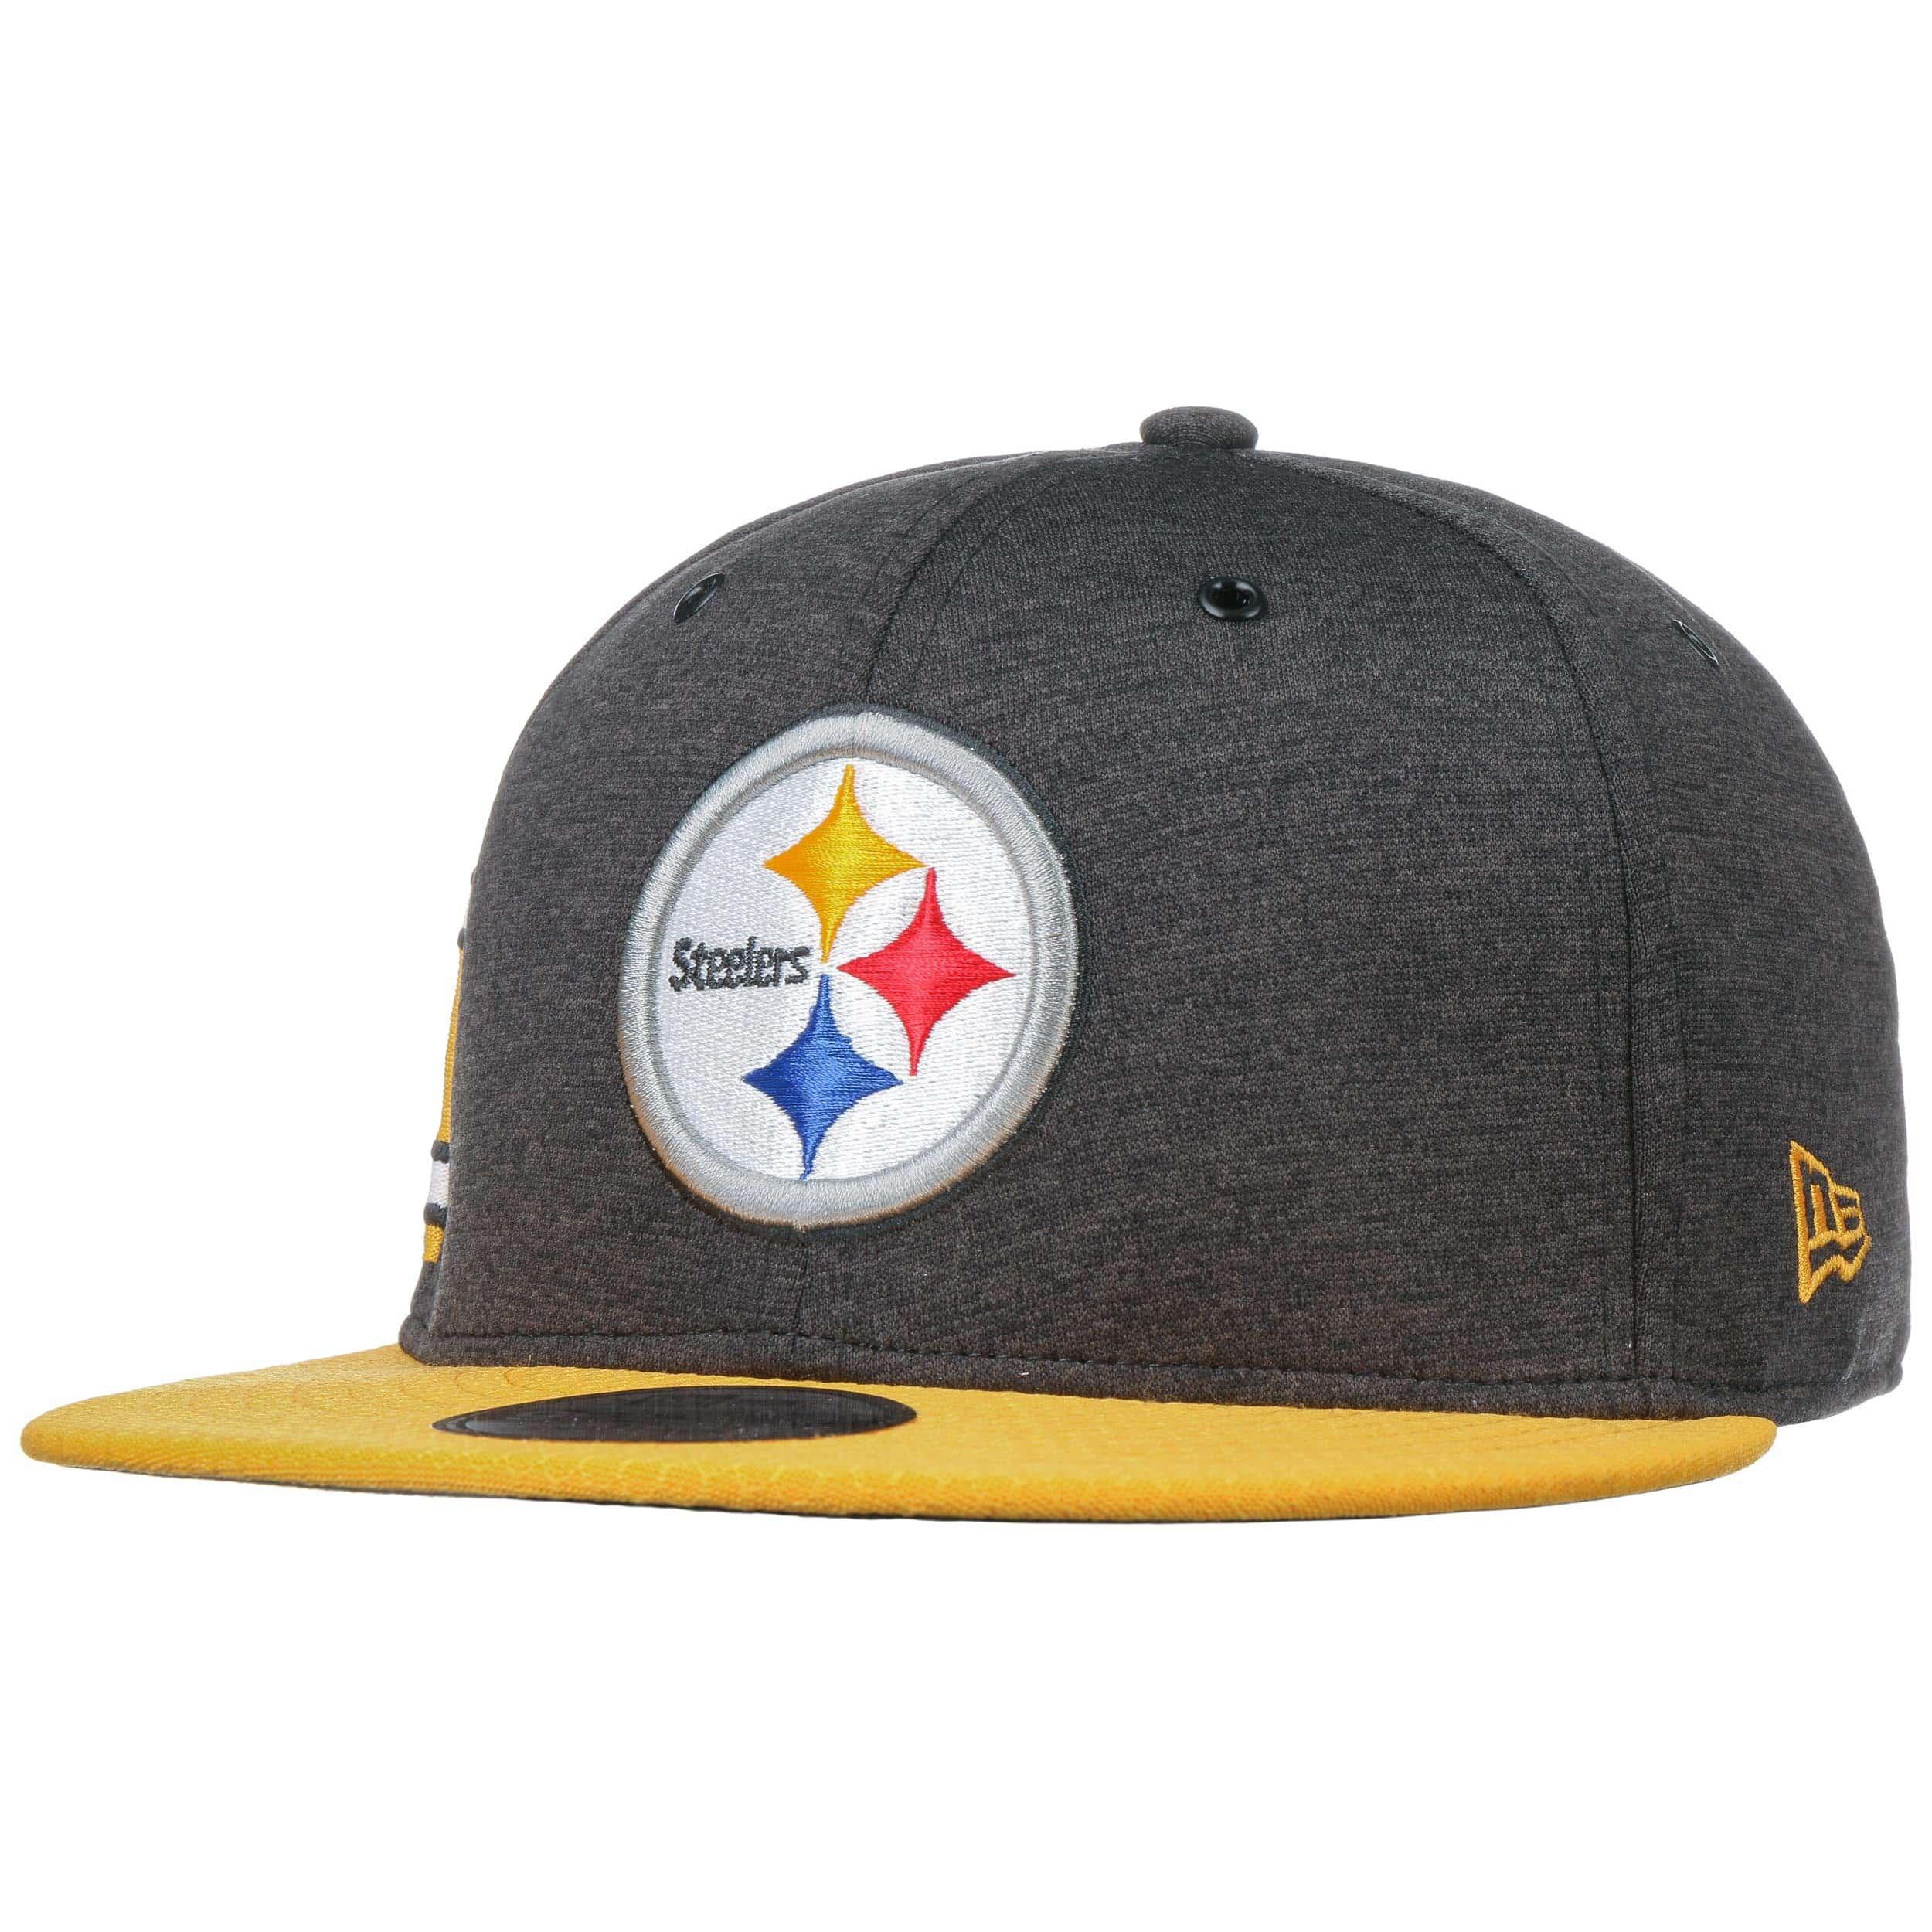 Gorra 9Fifty On-Field 18 Steelers by New Era - Gorras - sombreroshop.es faebc66f9a5